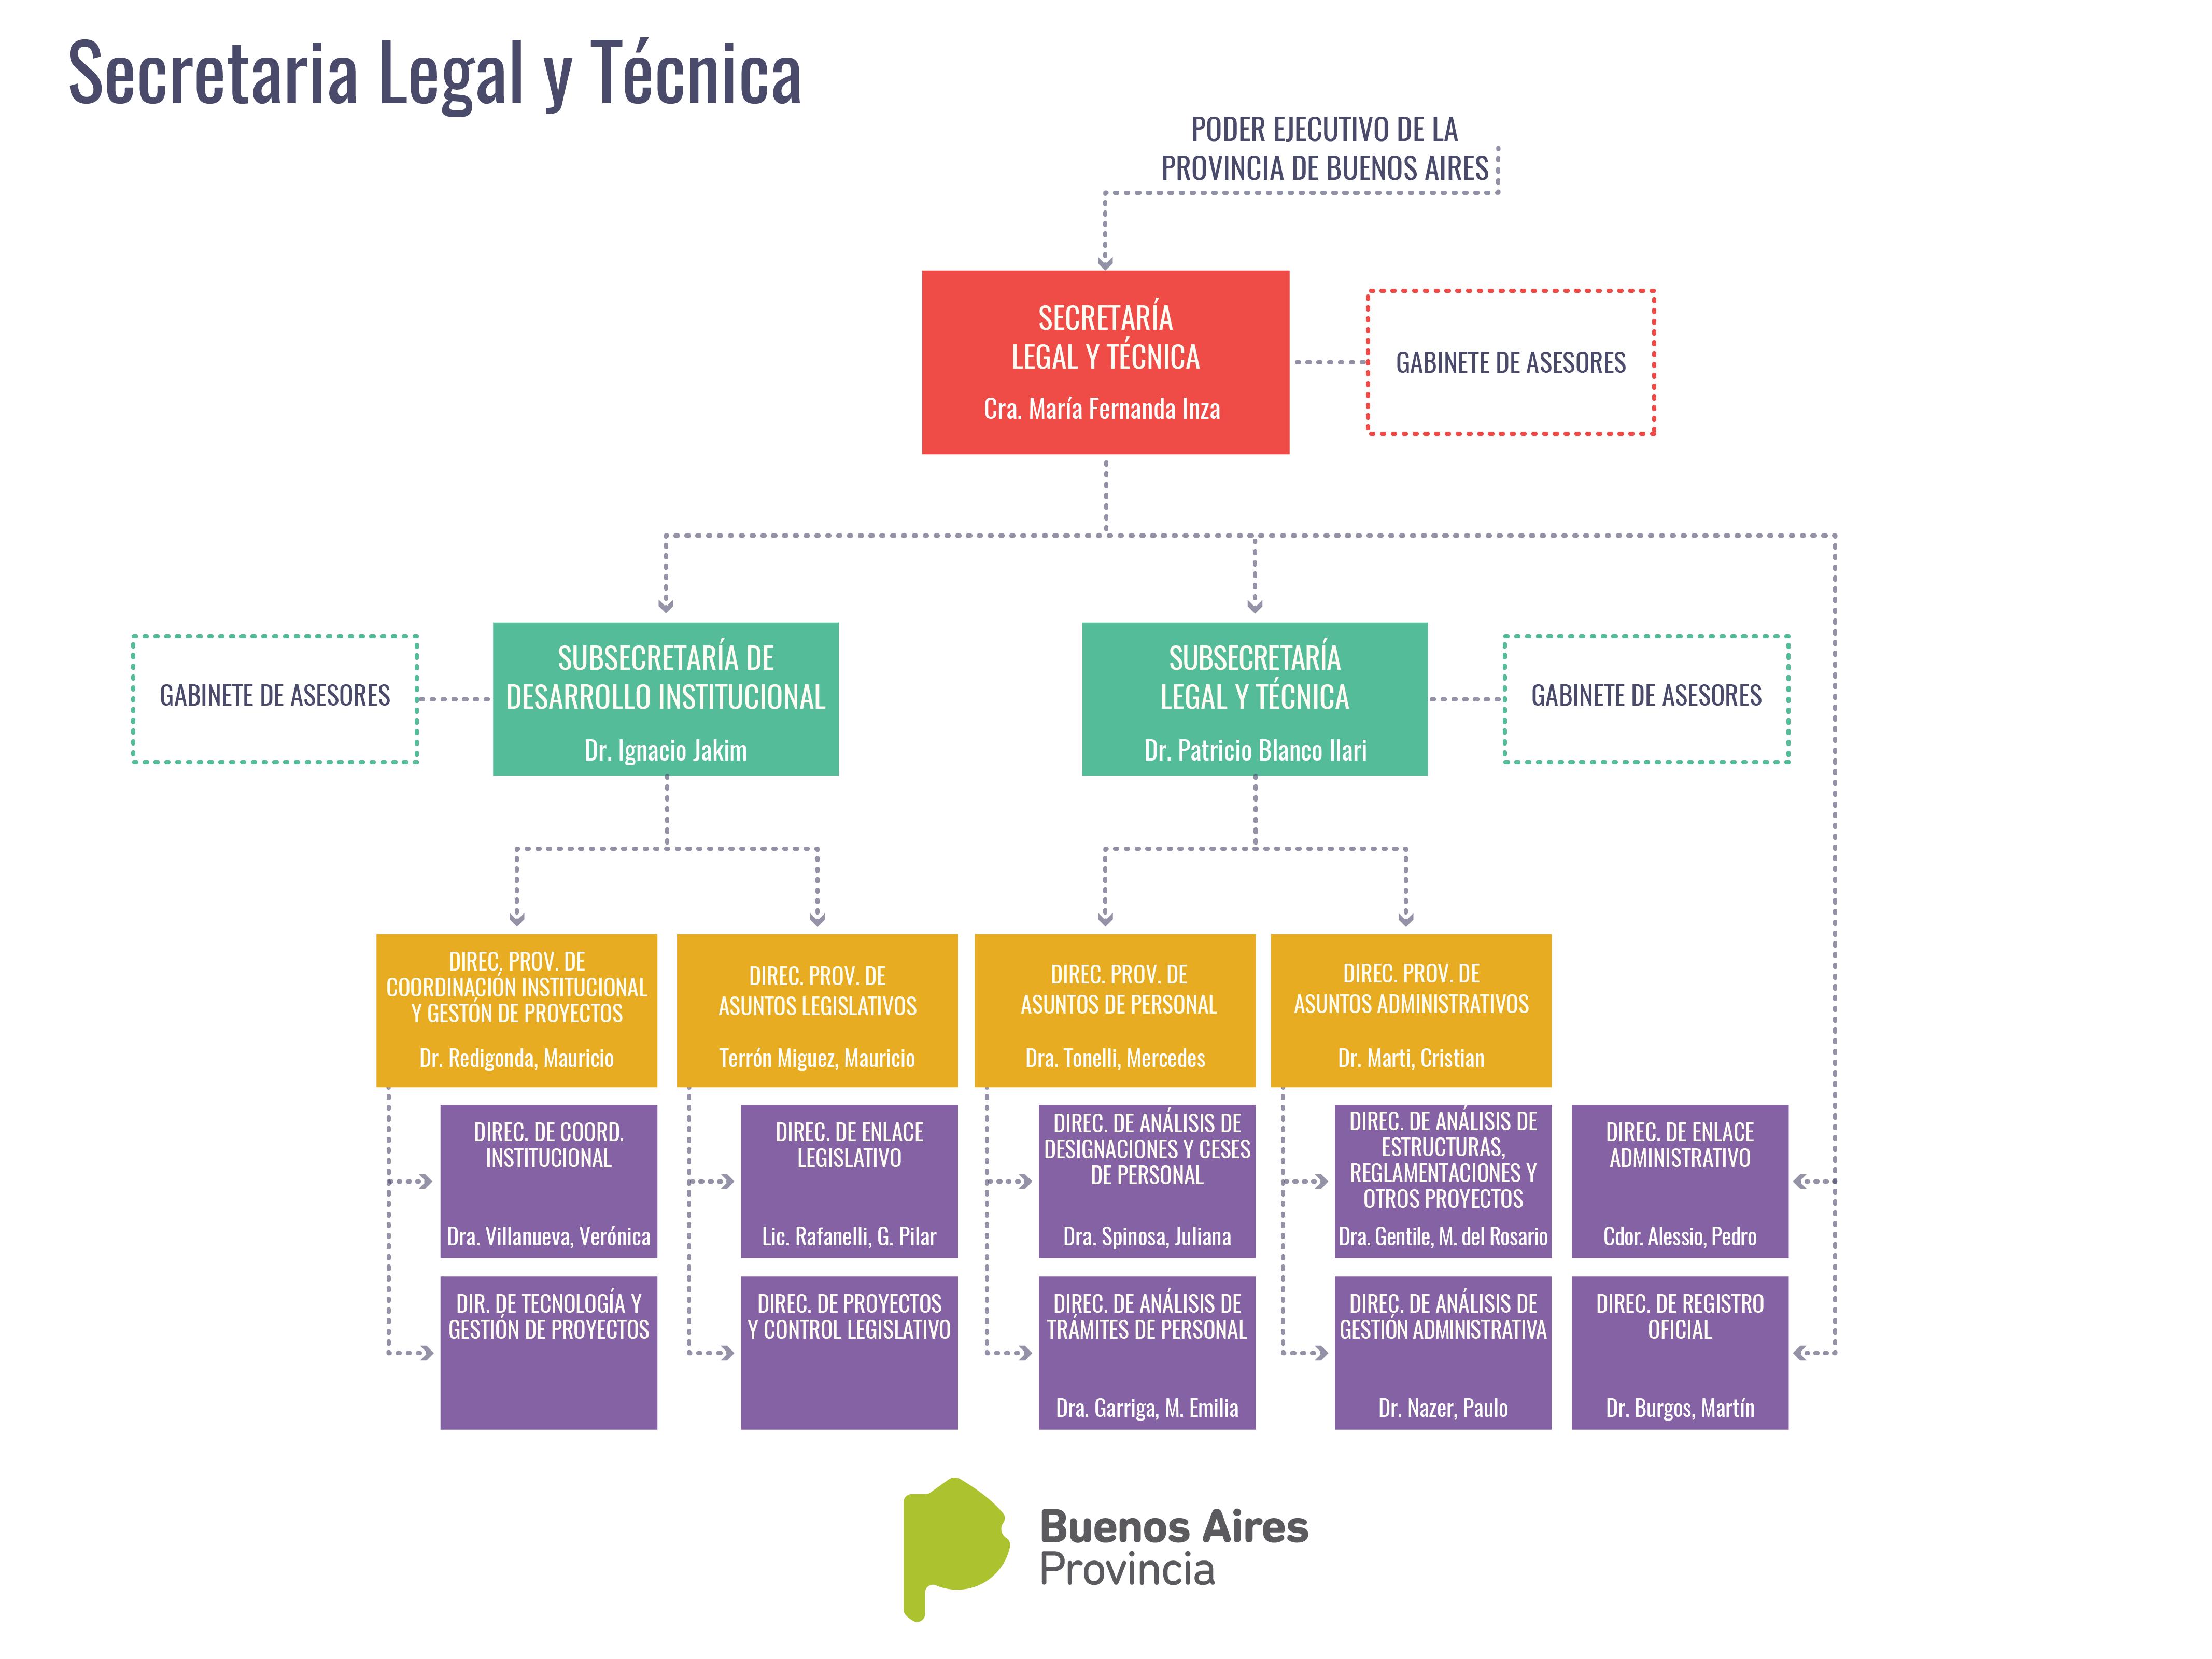 Organigrama Secretaria Legal y Técnica